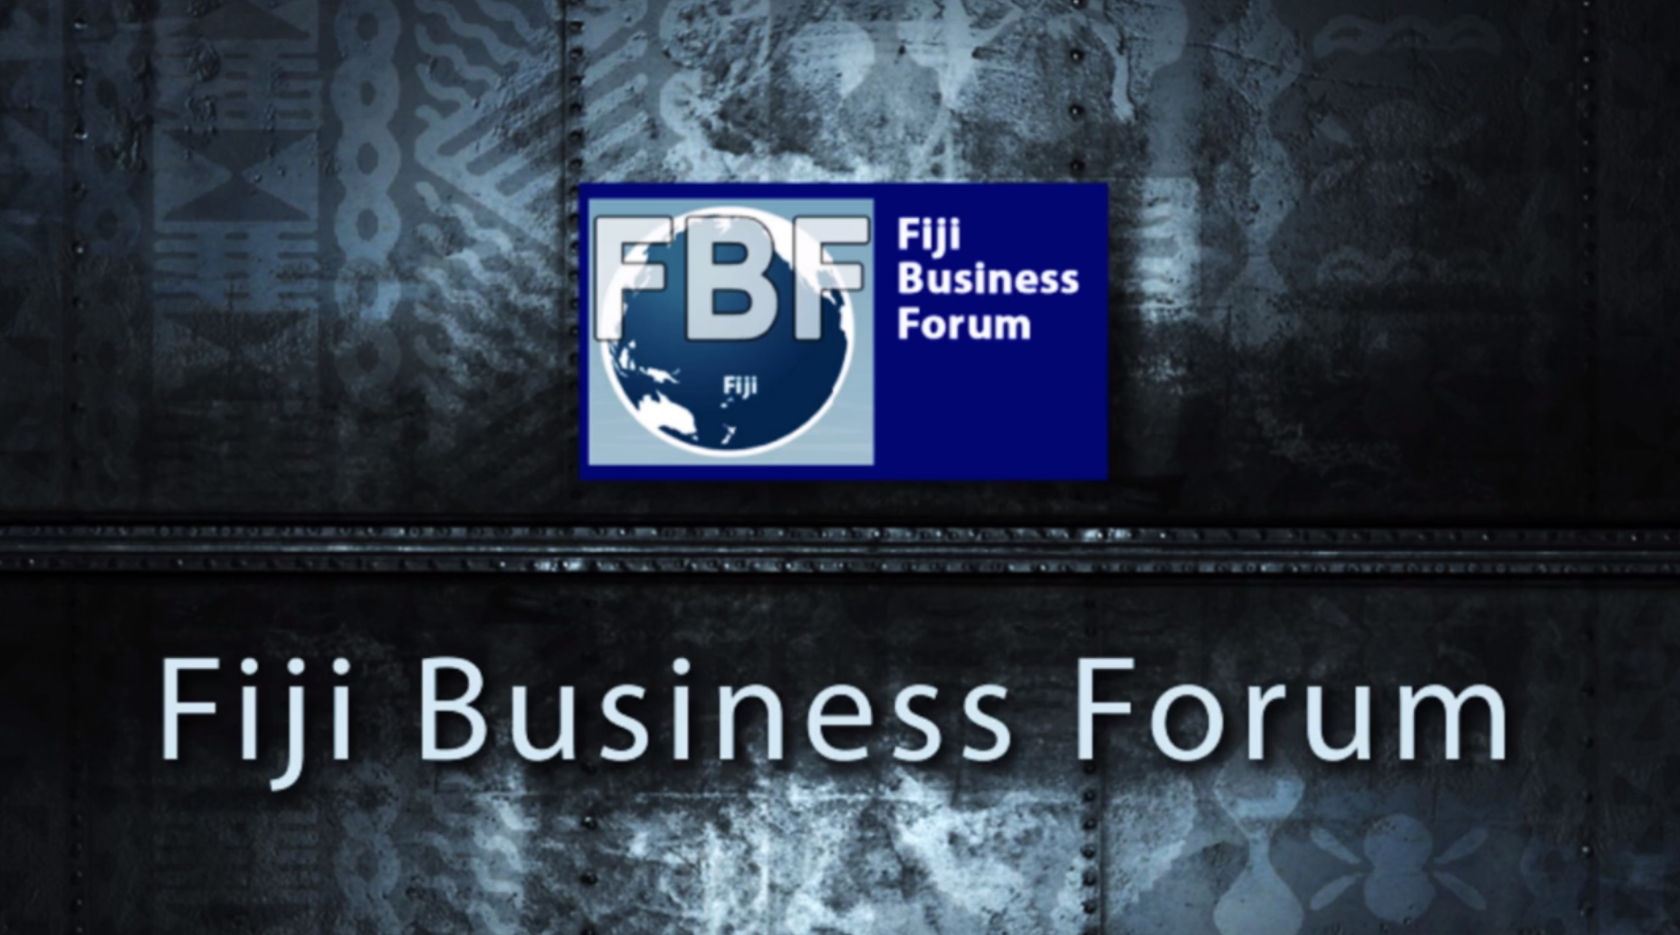 Fiji Business Forum 2013